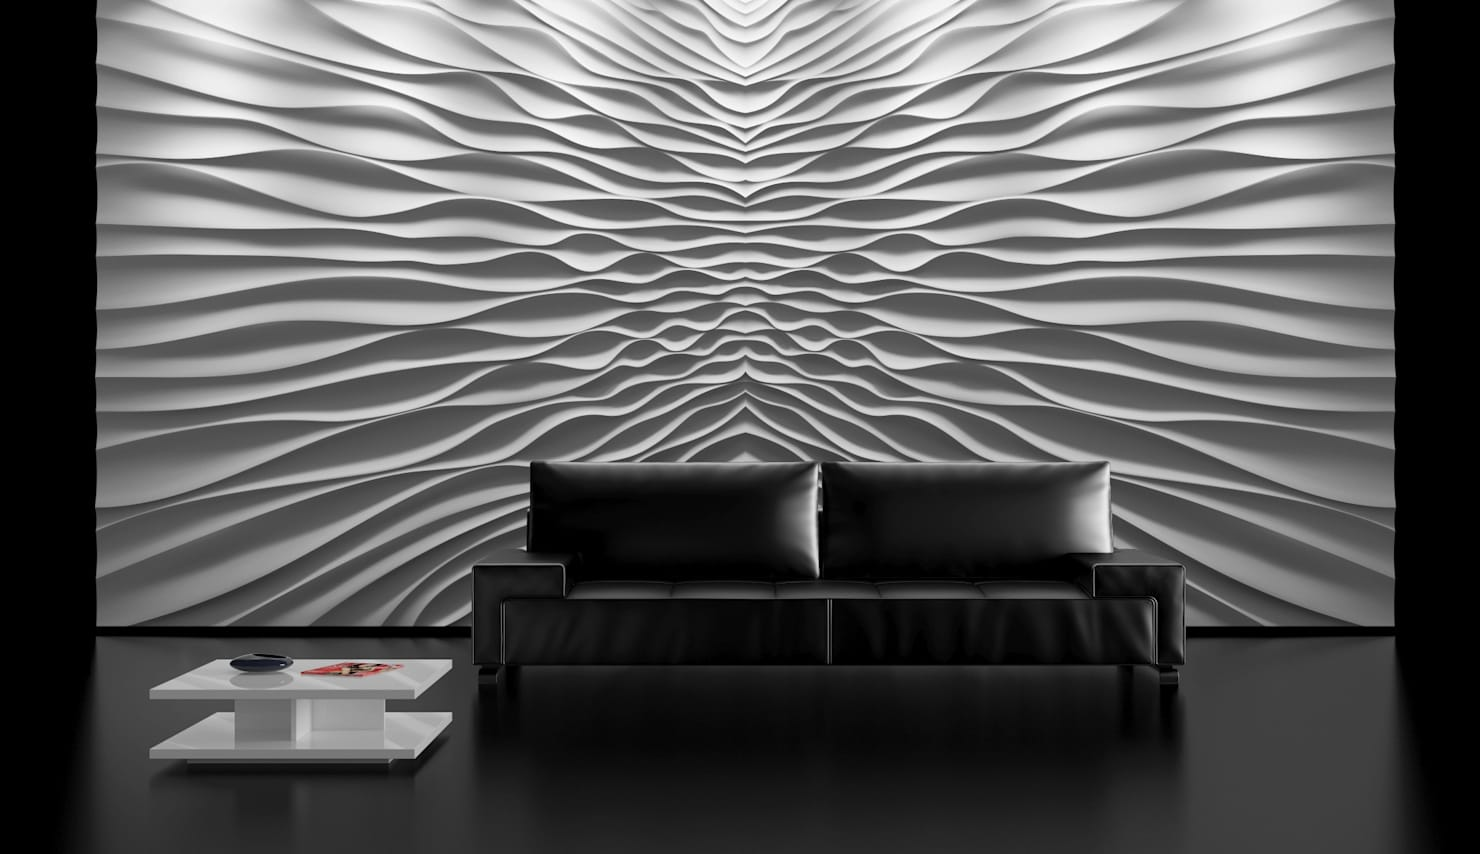 diy on flipboard by ingrid spacil lifestyle caterpillars powerstrip. Black Bedroom Furniture Sets. Home Design Ideas